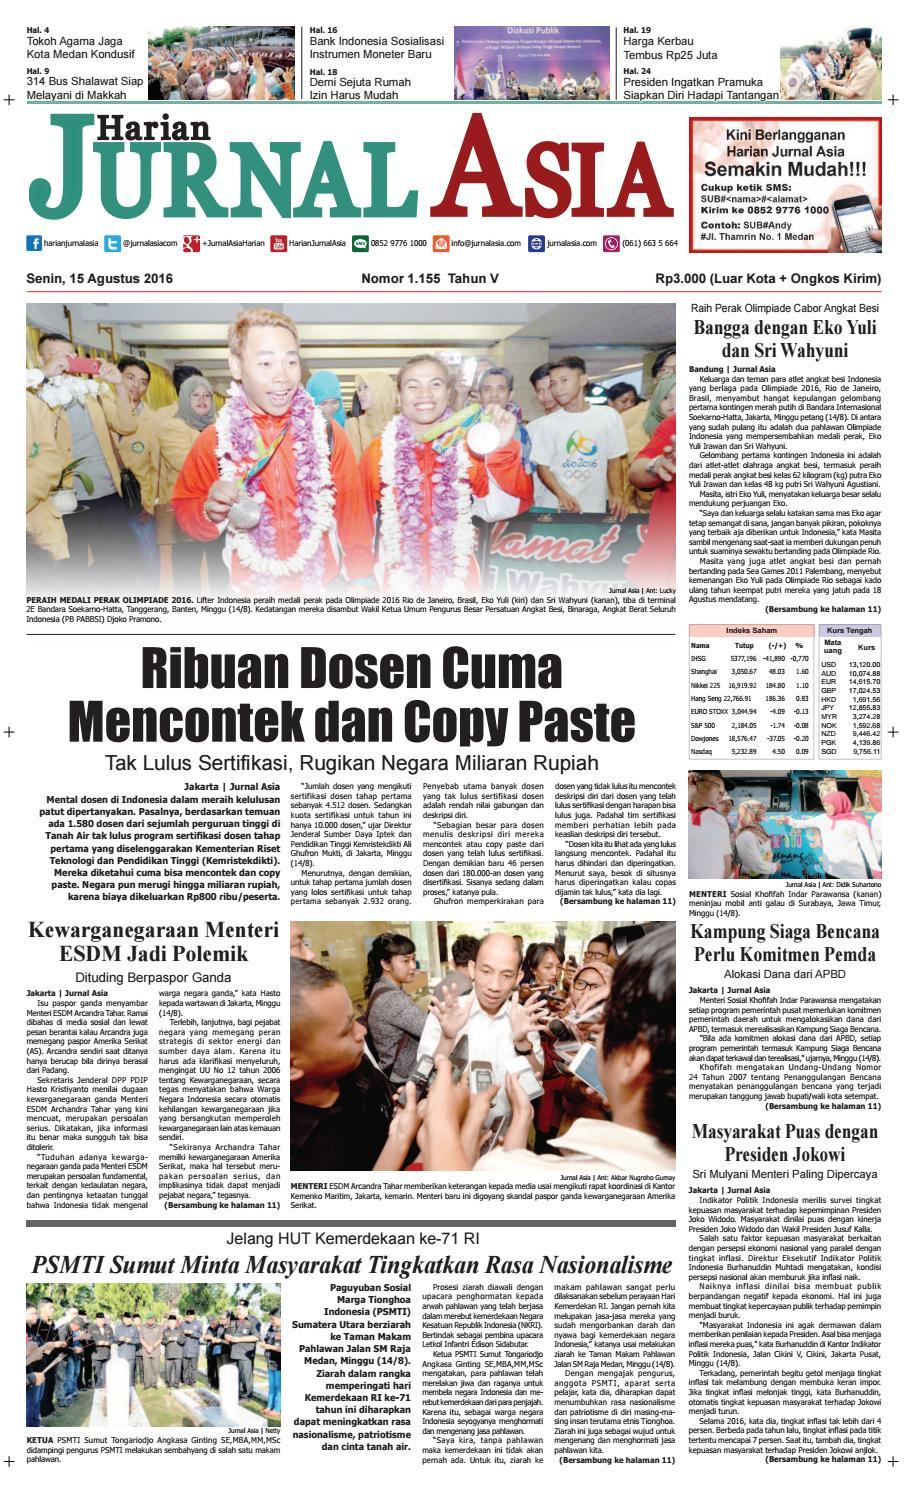 Harian Jurnal Asia Edisi Senin 15 Agustus 2016 By Produk Ukm Bumn Jamu Instan Abah Aromahtrenggalek Medan Issuu